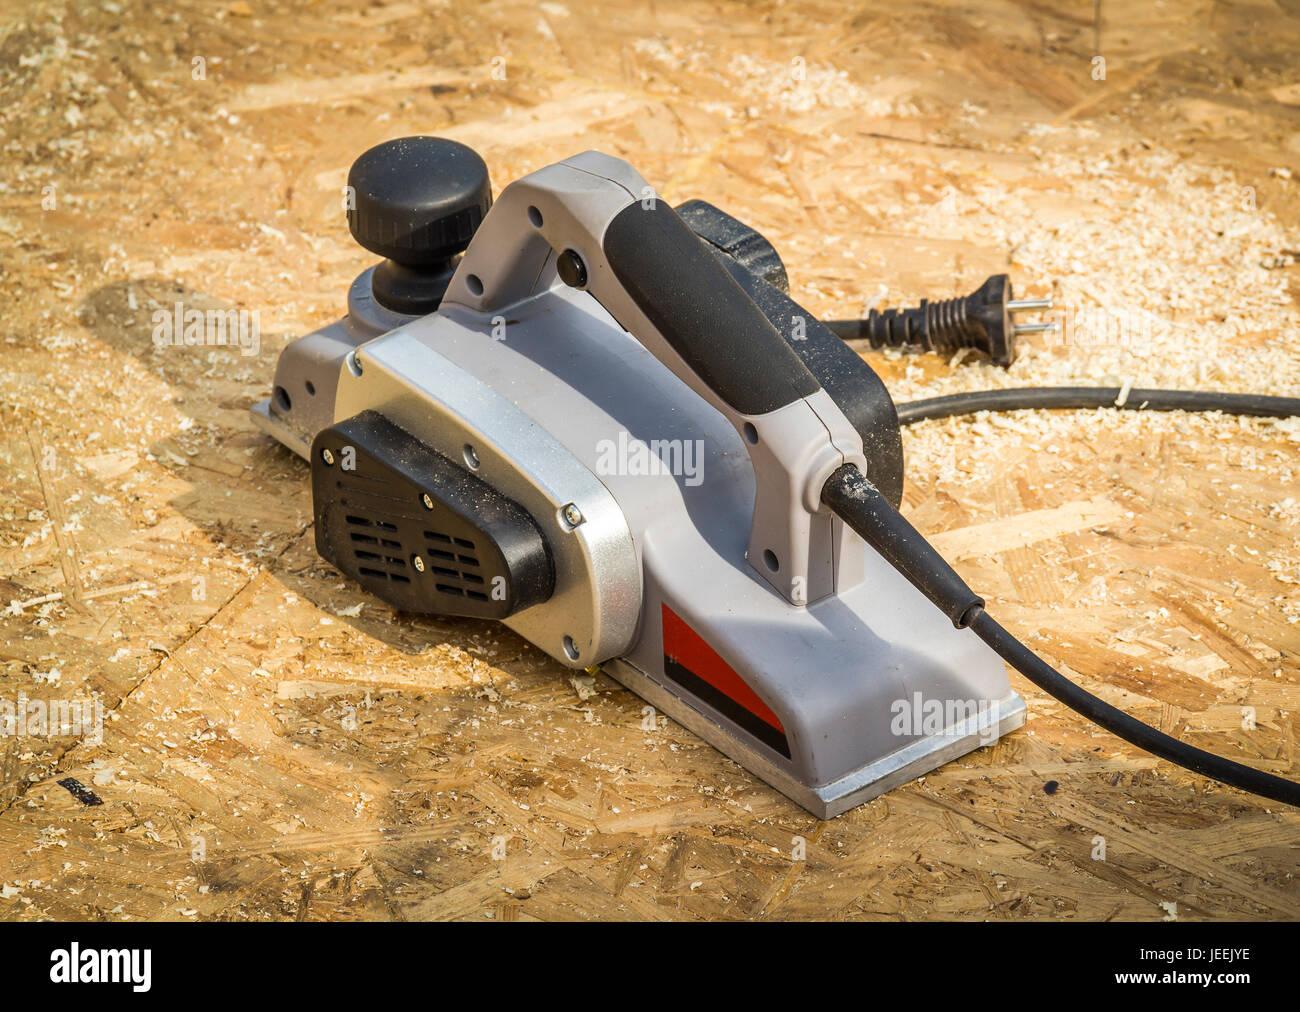 Power Planer Stockfotos & Power Planer Bilder - Alamy